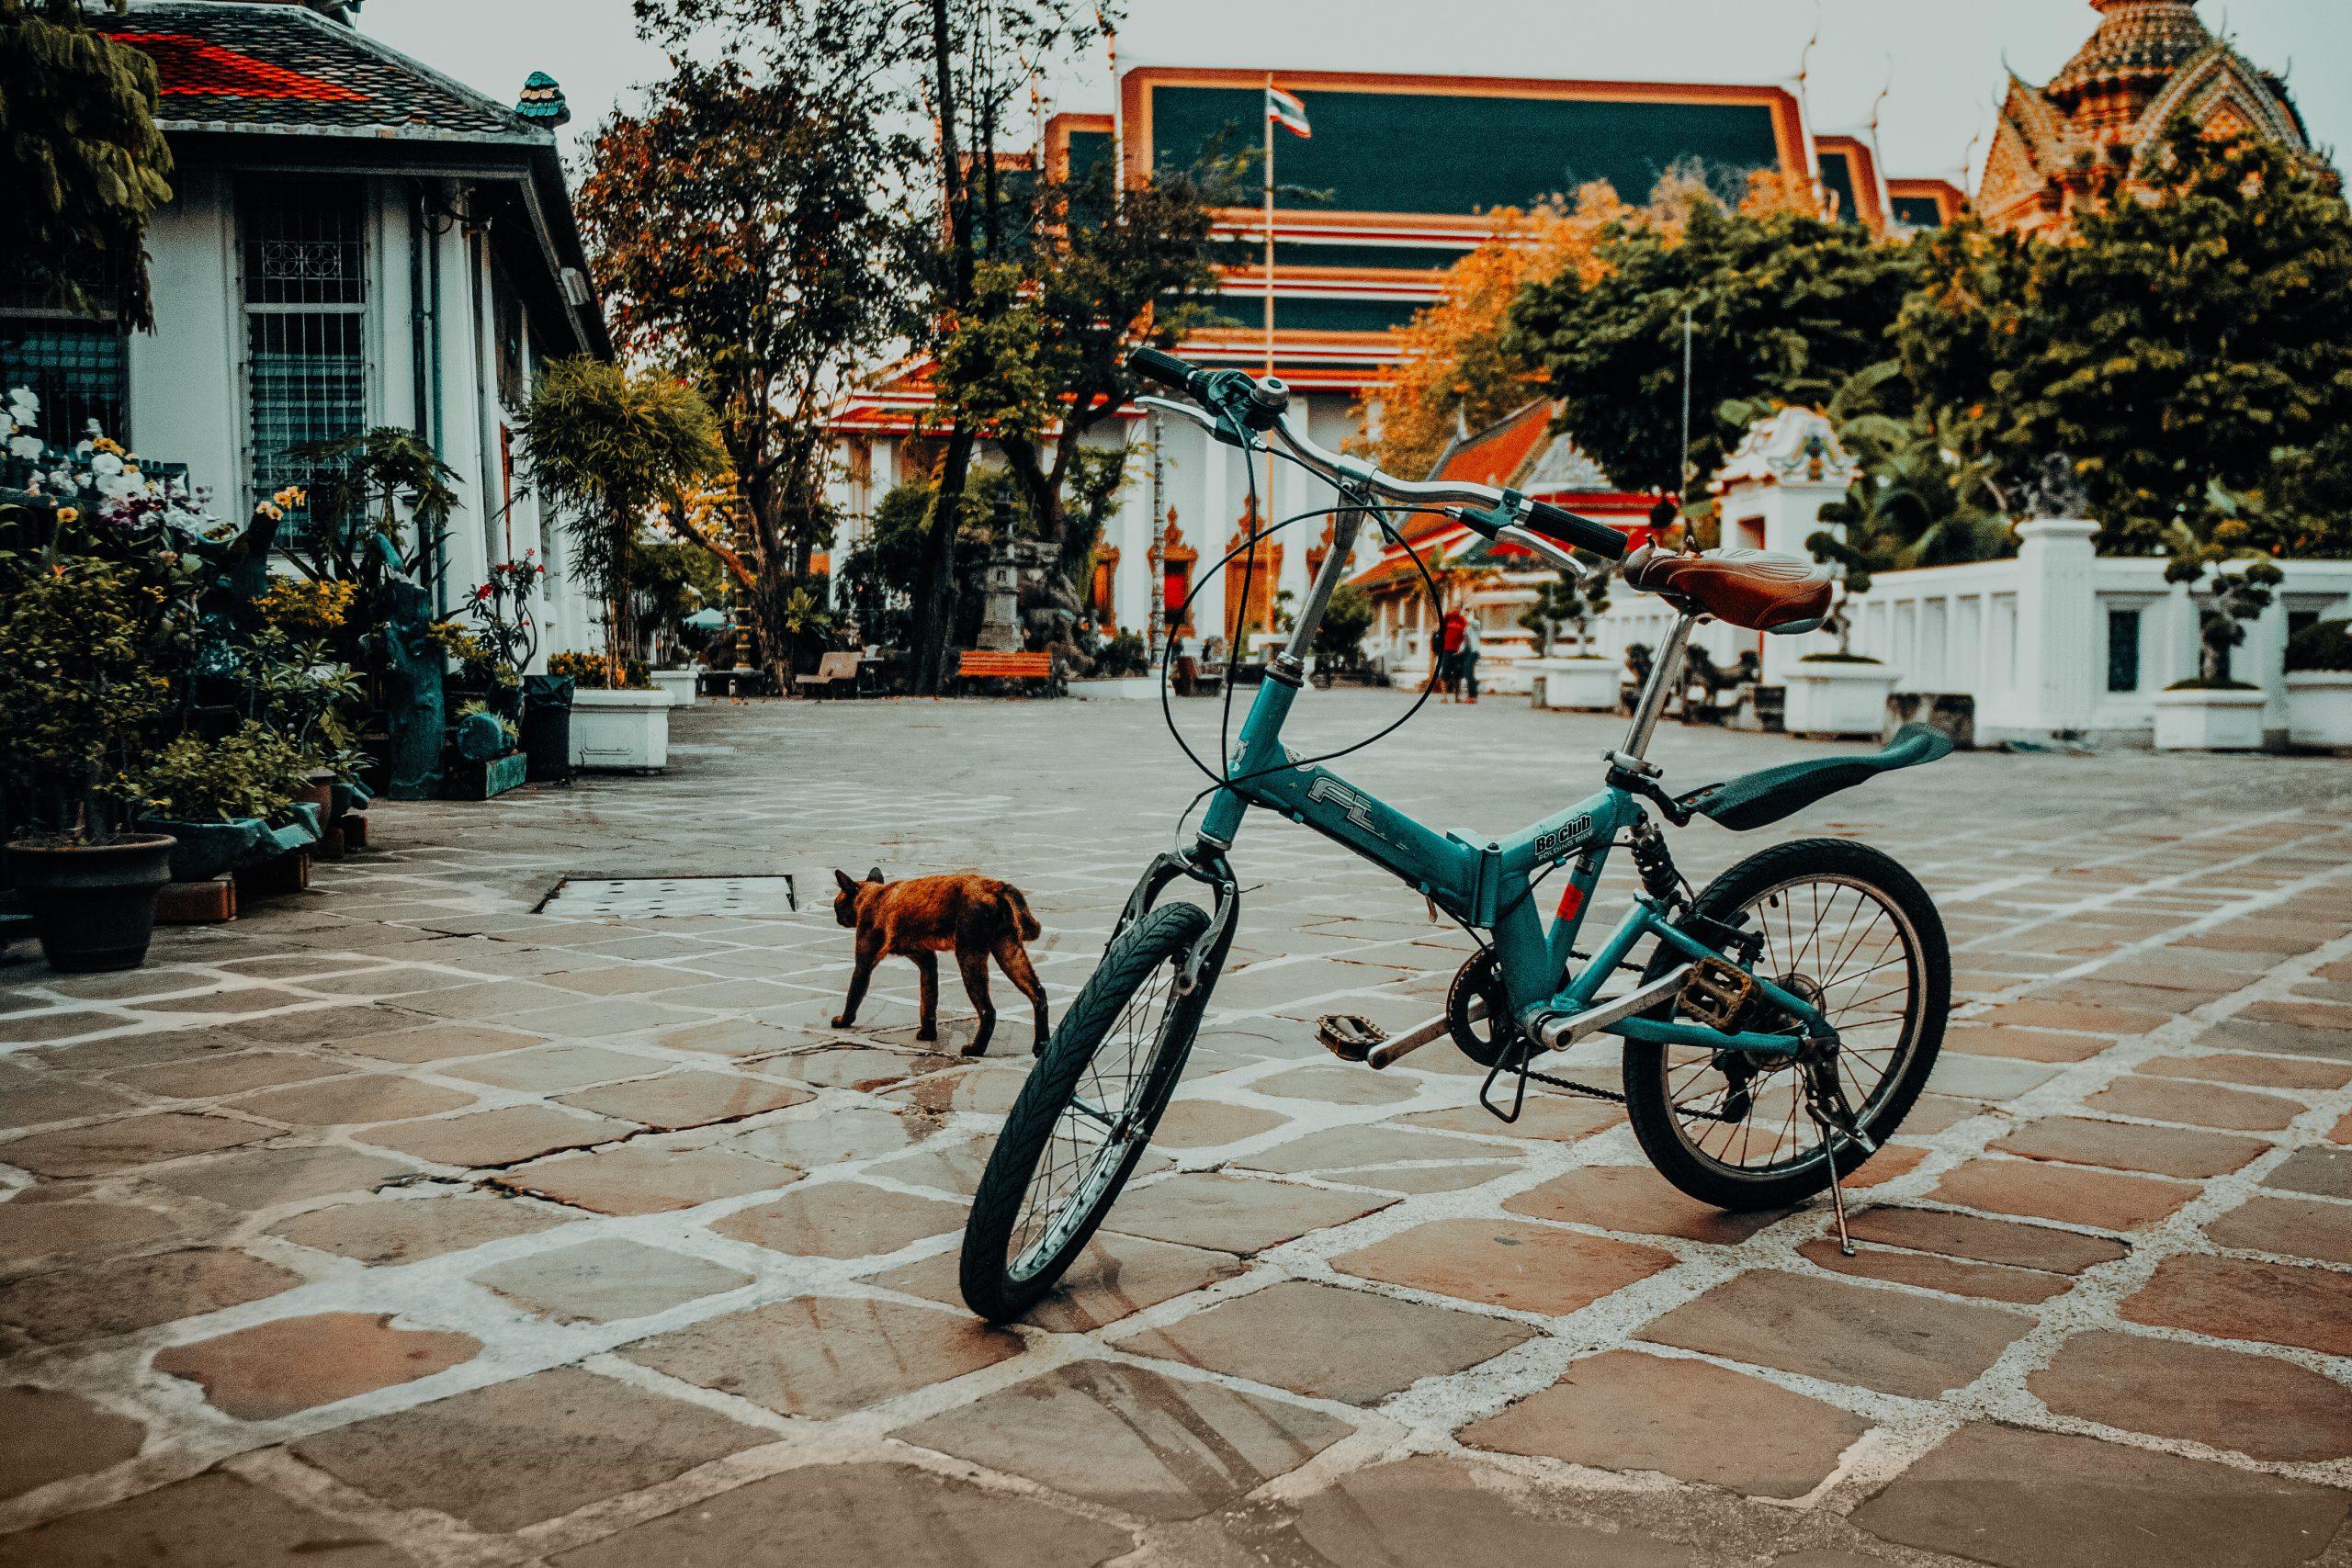 Bicycle in Wat Pho – Thailand